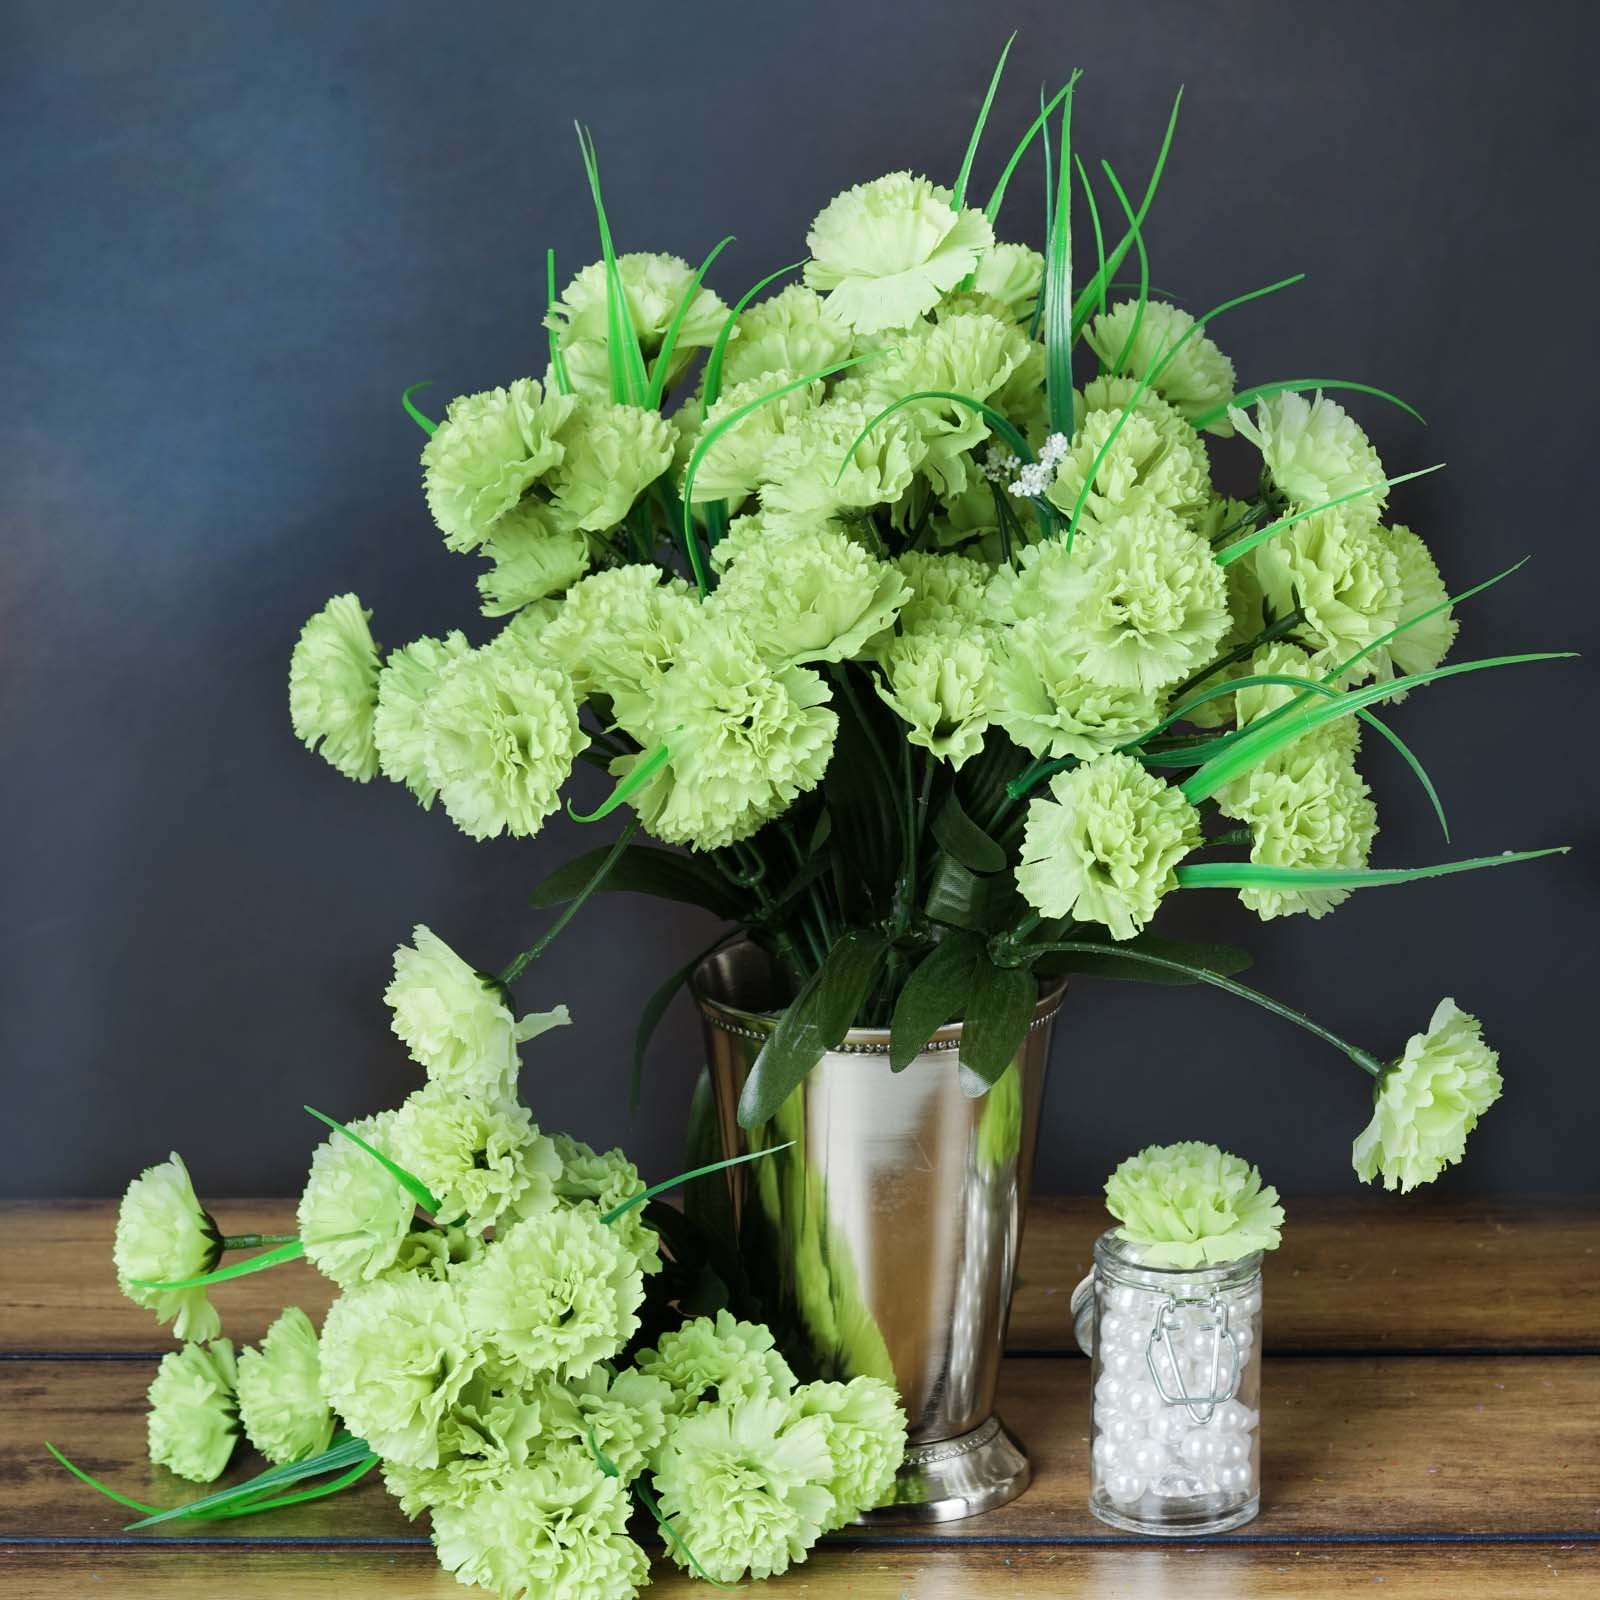 BalsaCircle 252 Mini Silk Carnations Flowers - DIY Home Wedding Party Artificial Bouquets Arrangements Centerpieces